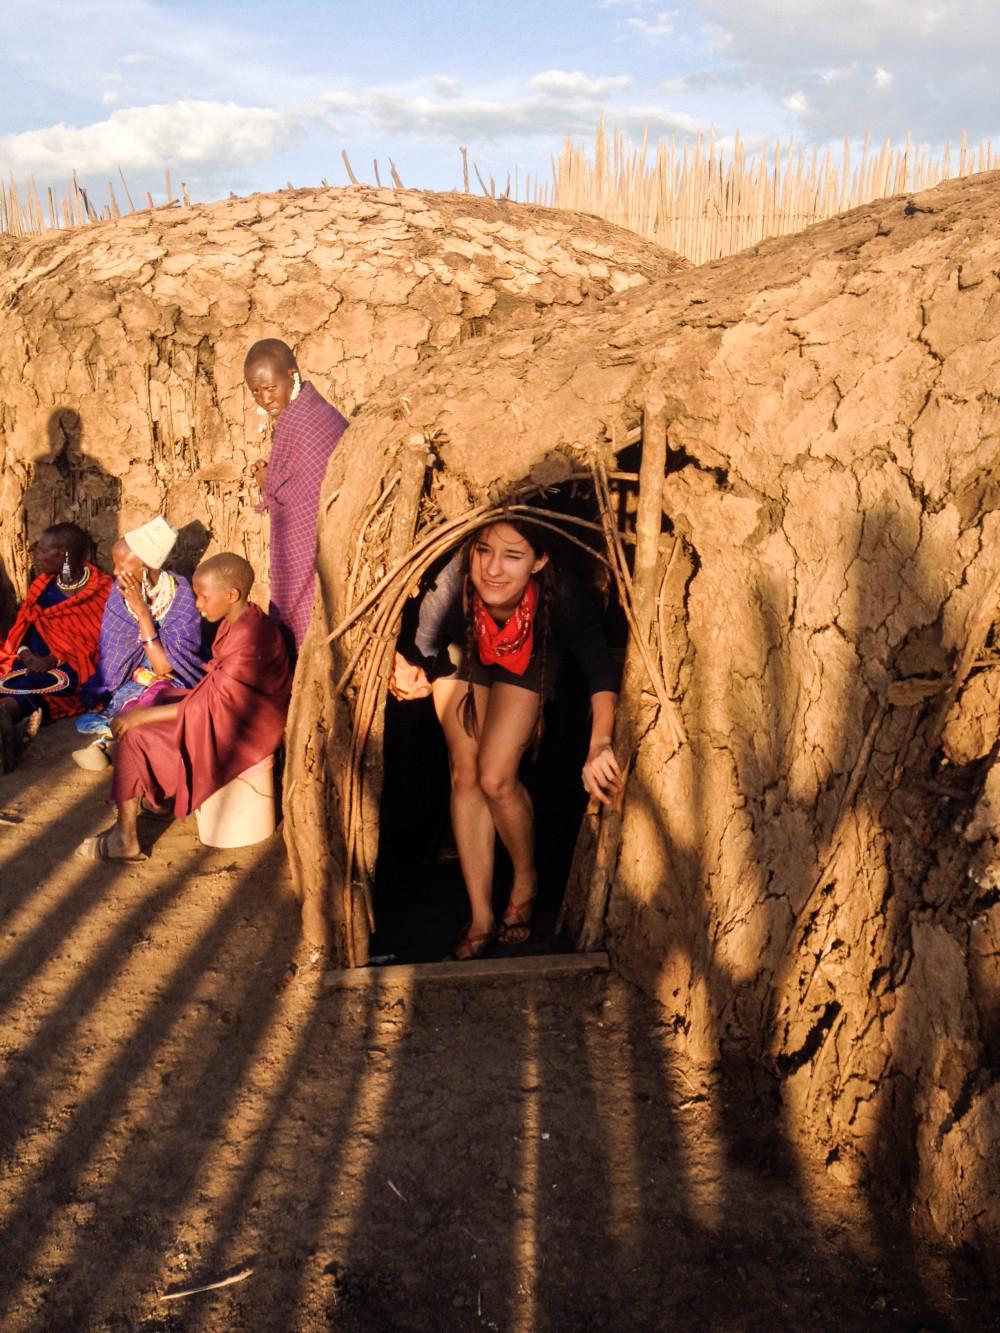 masai home twins on tour kasia kowalczyk